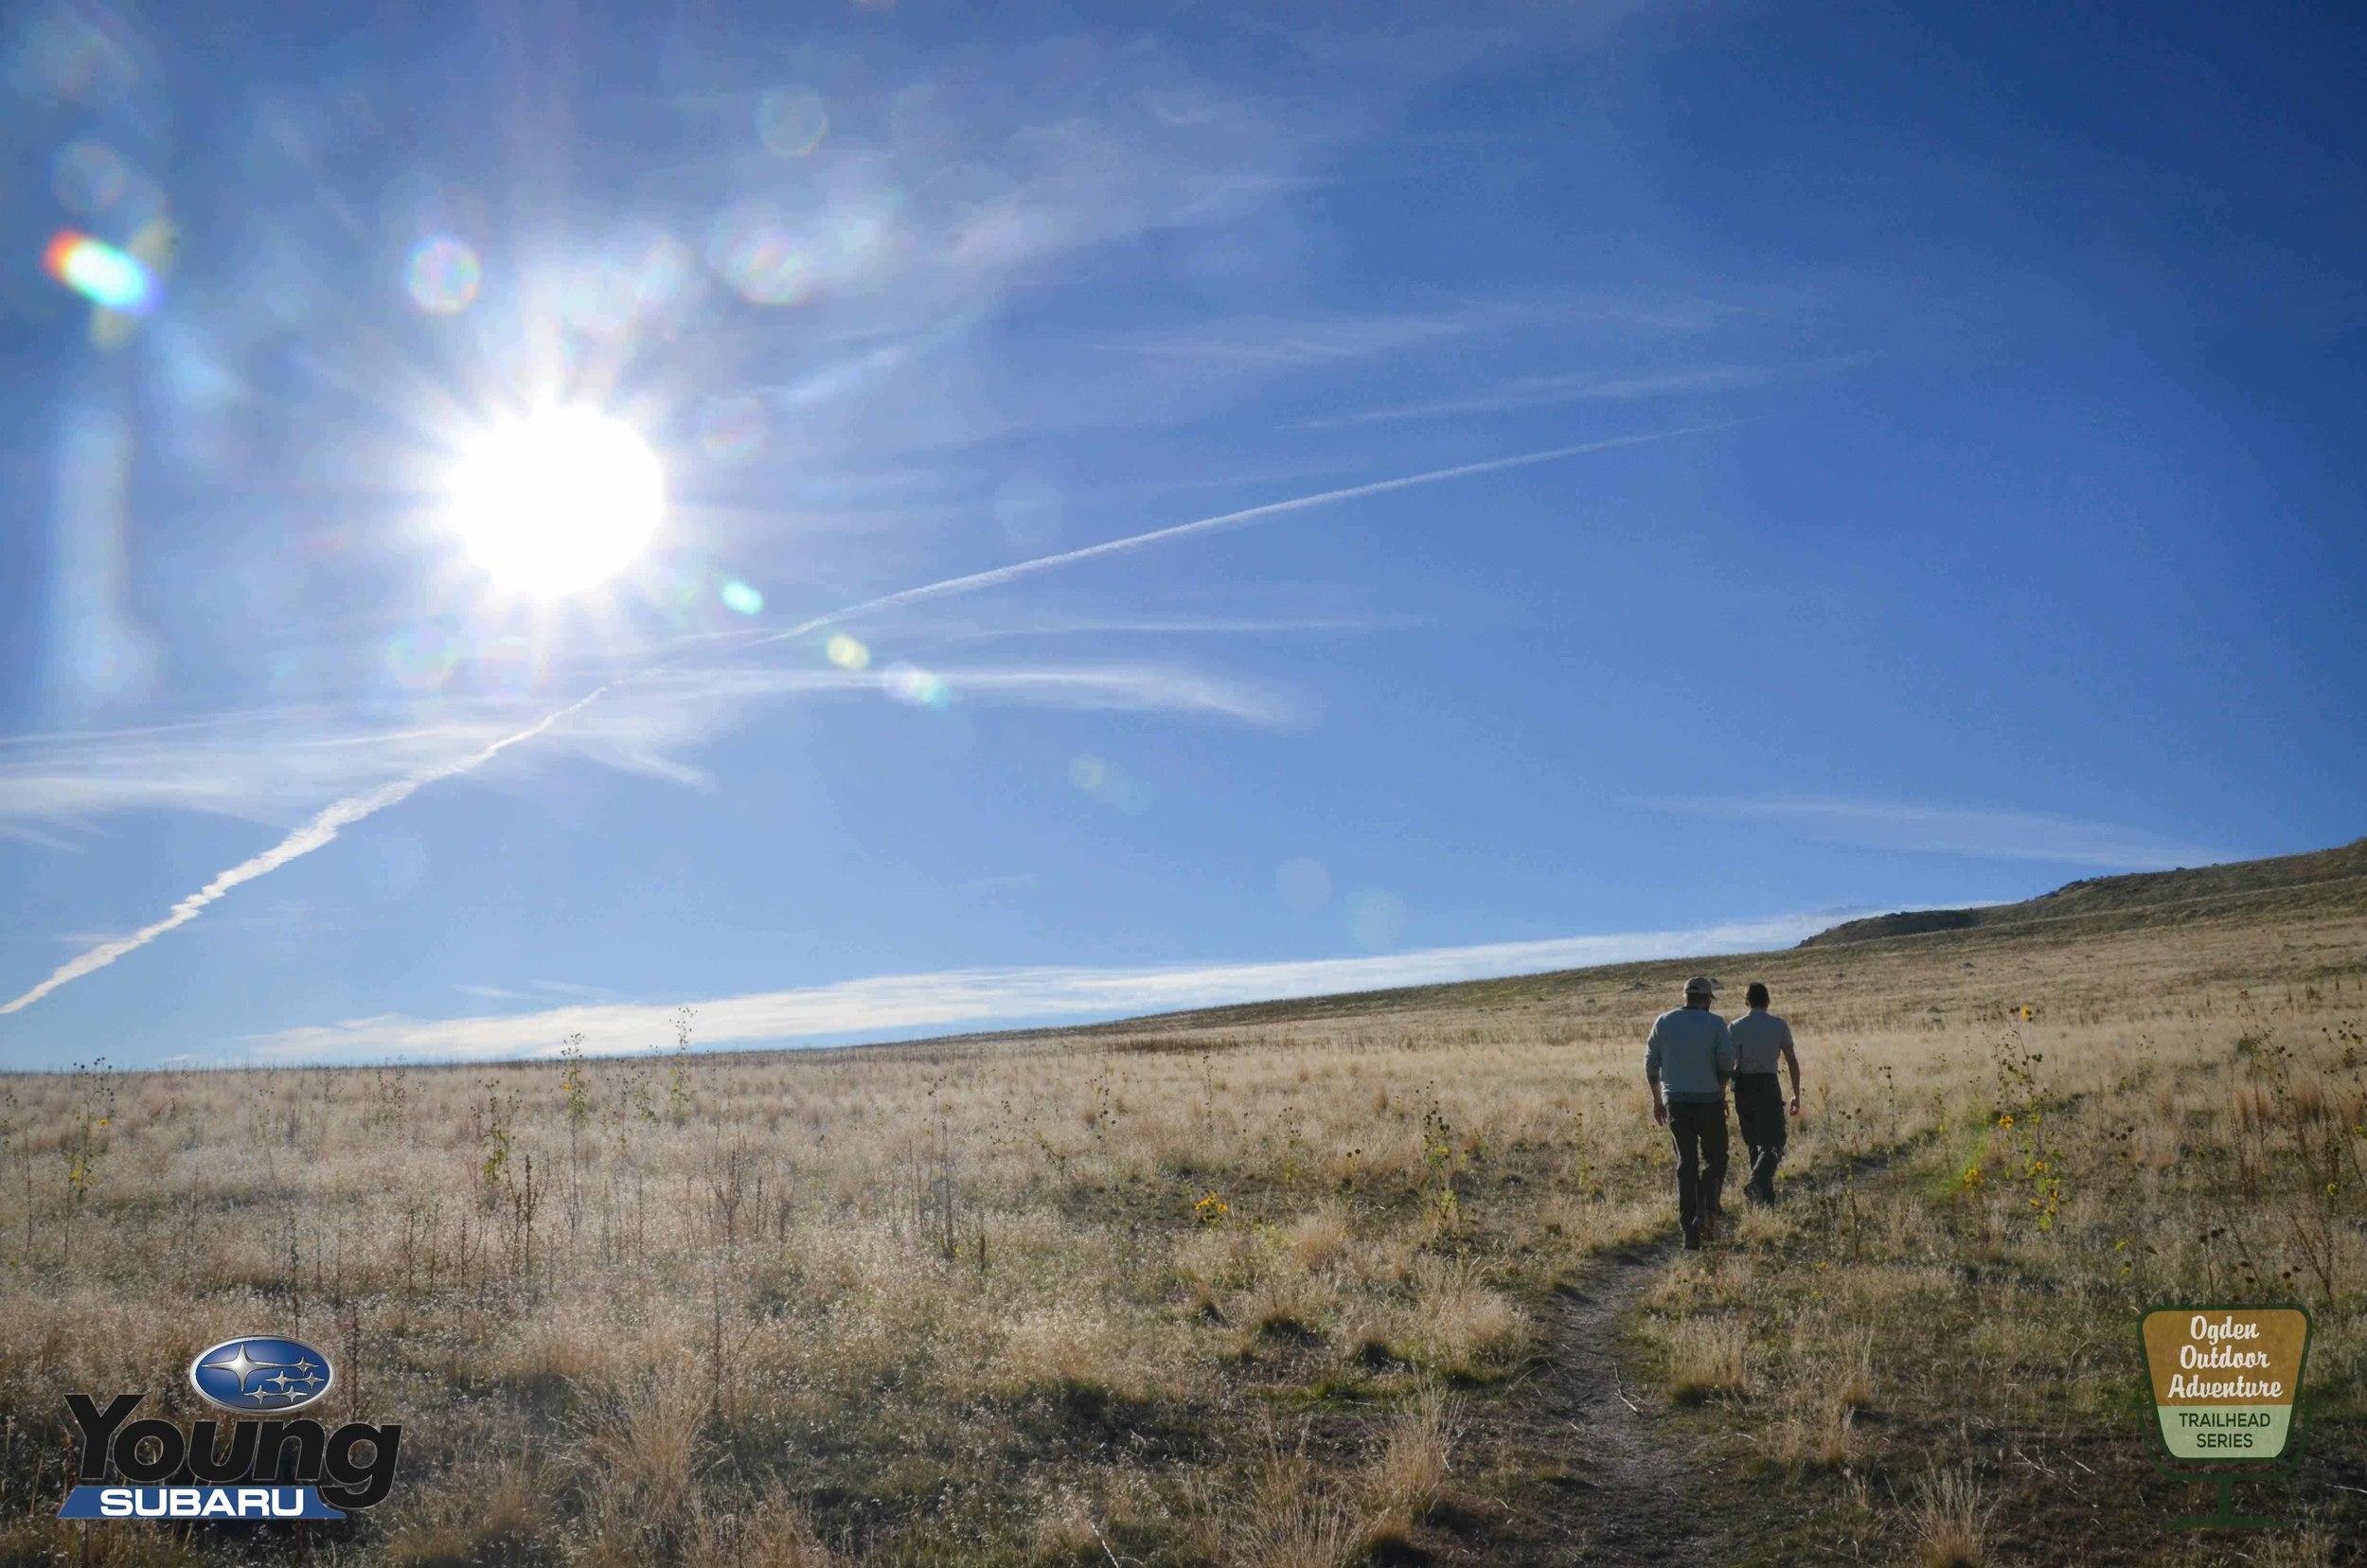 Hiking an unmarked Buffalo trail on Antelope Island